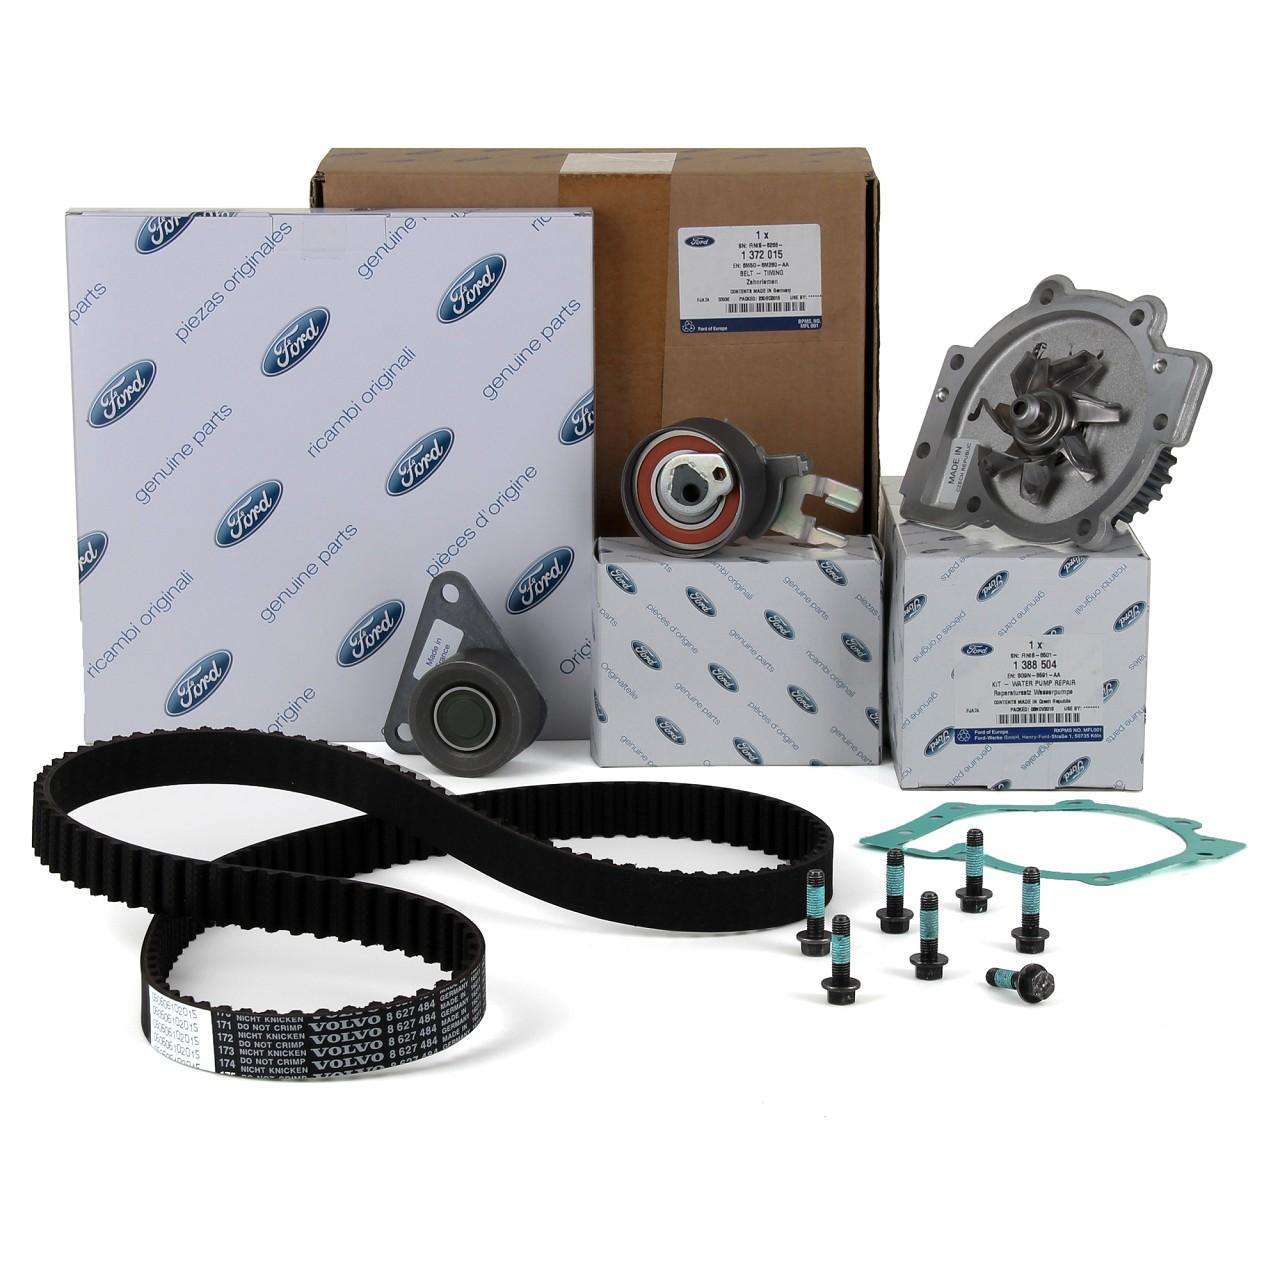 ORIGINAL Ford Zahnriemensatz + Wasserpumpe Focus II ST RS Mondeo Kuga S-Max 2.5